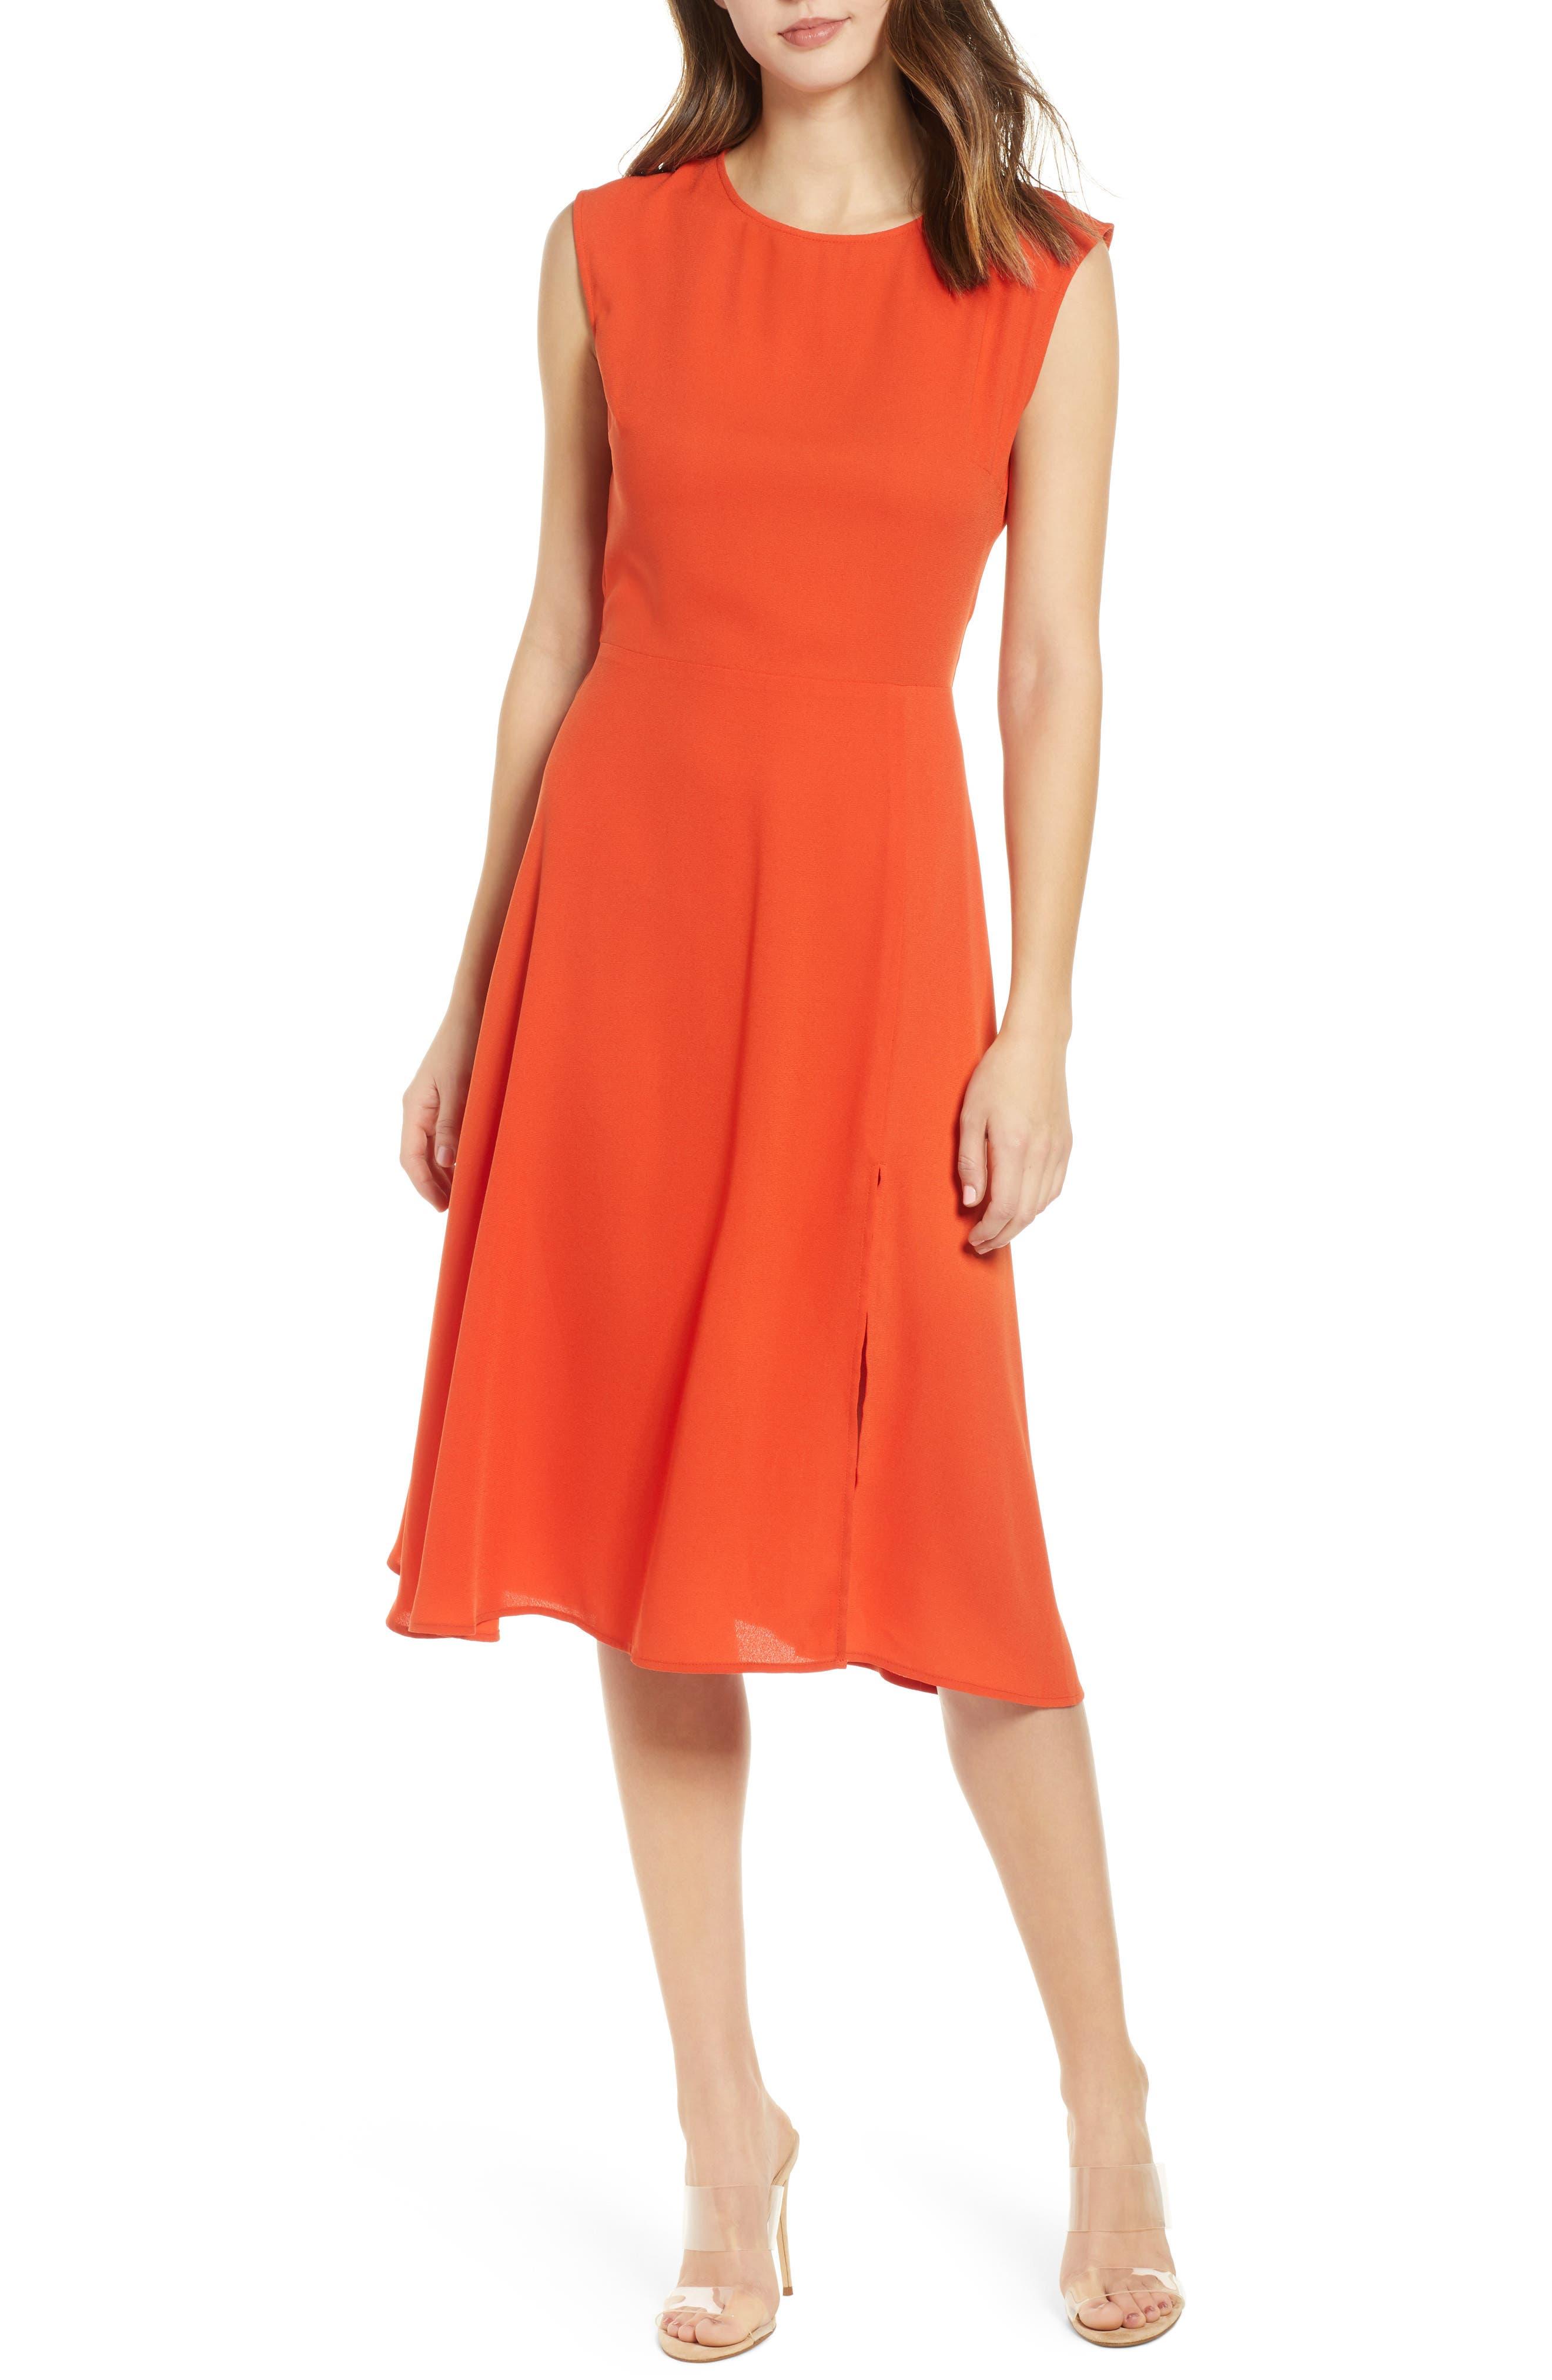 Leith Chic Midi Dress, Orange